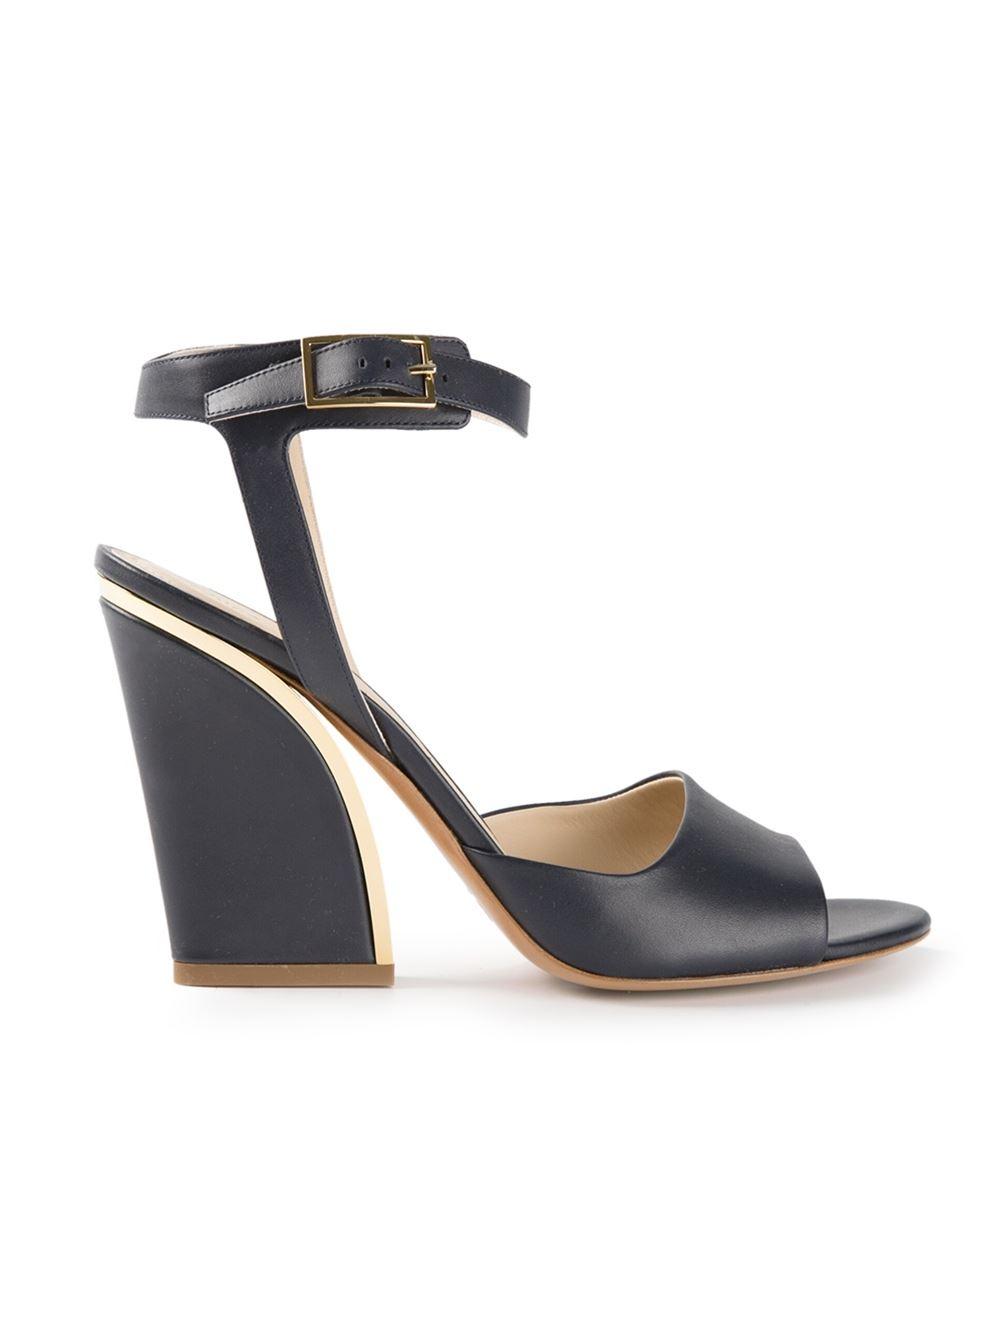 Chloé Chunky Heel Sandals - Biondini Paris - Farfetch.com